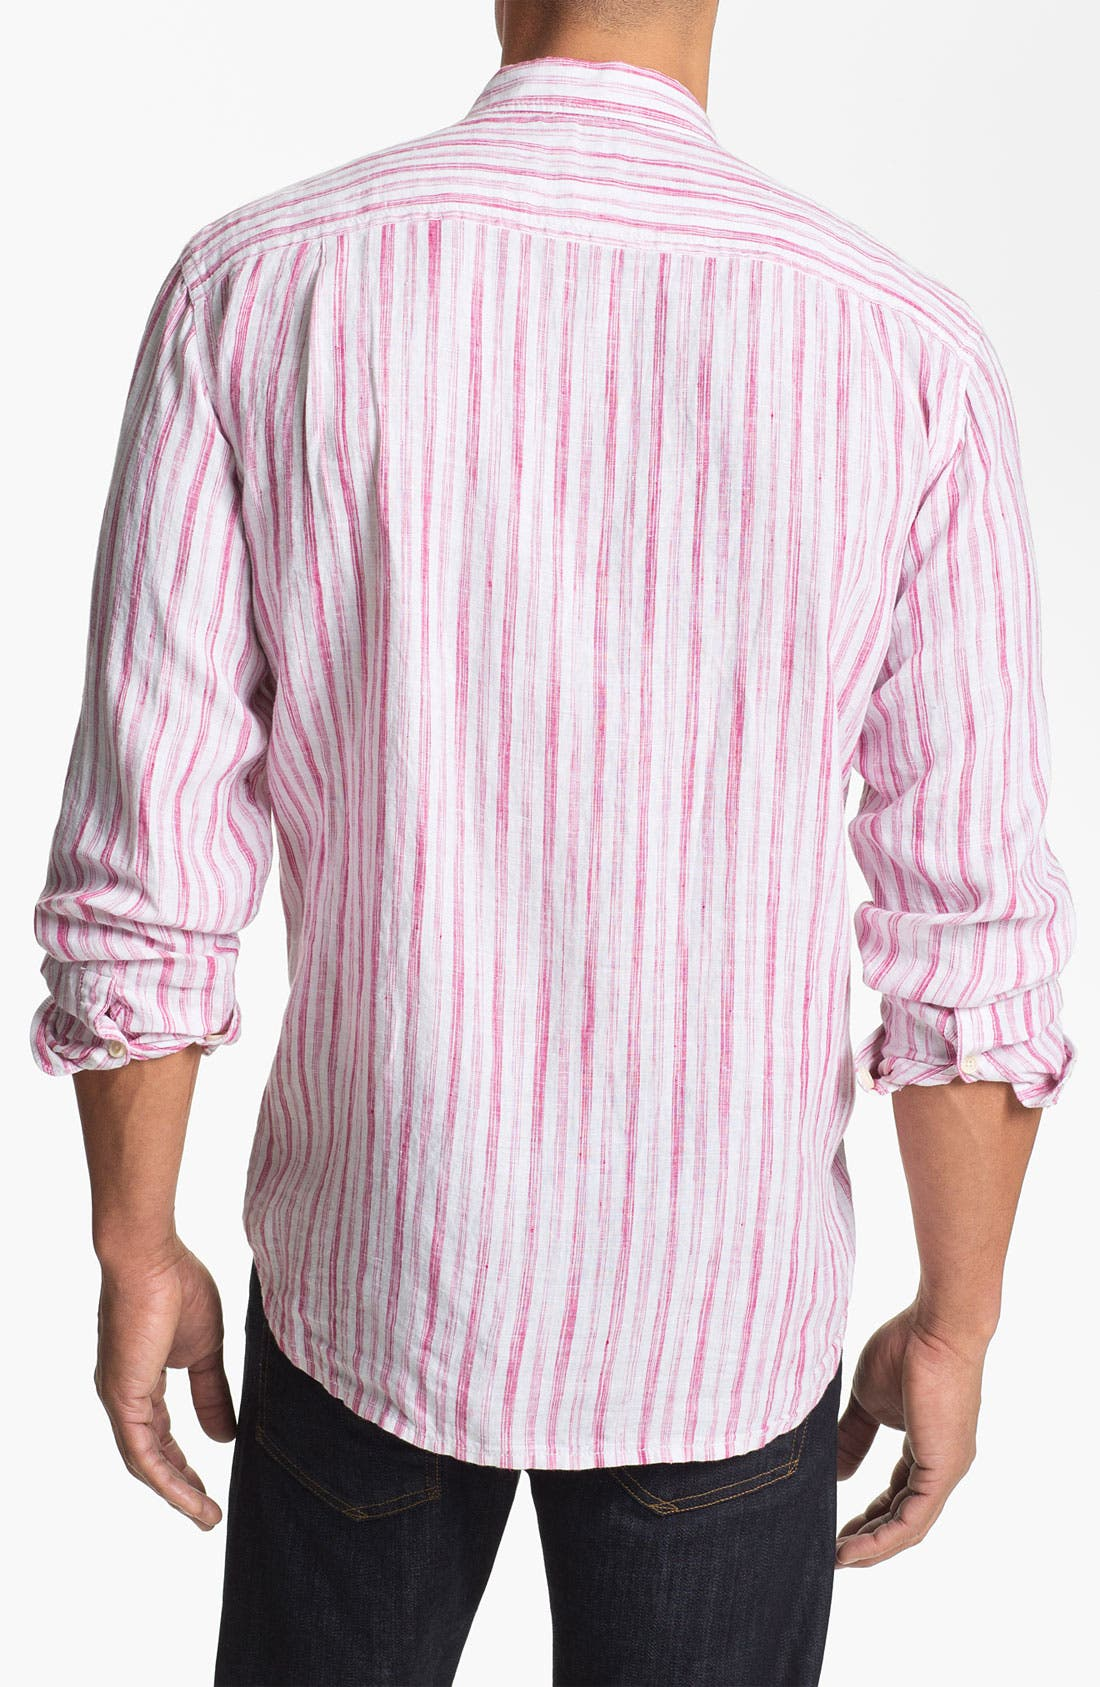 Alternate Image 2  - Tommy Bahama 'Academy' Regular Fit Sport Shirt (Big & Tall)